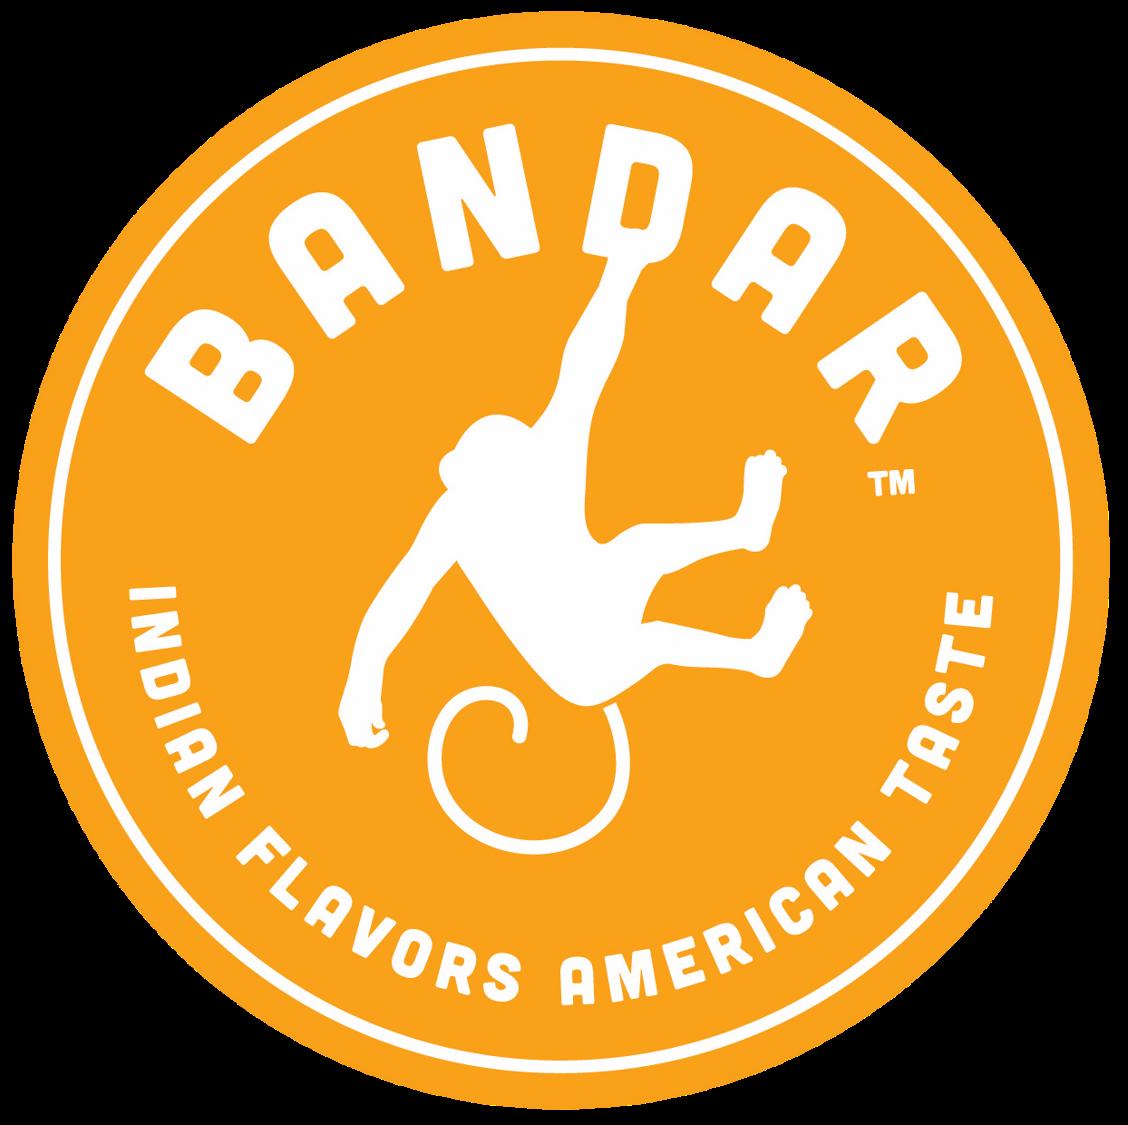 Bandar Foods